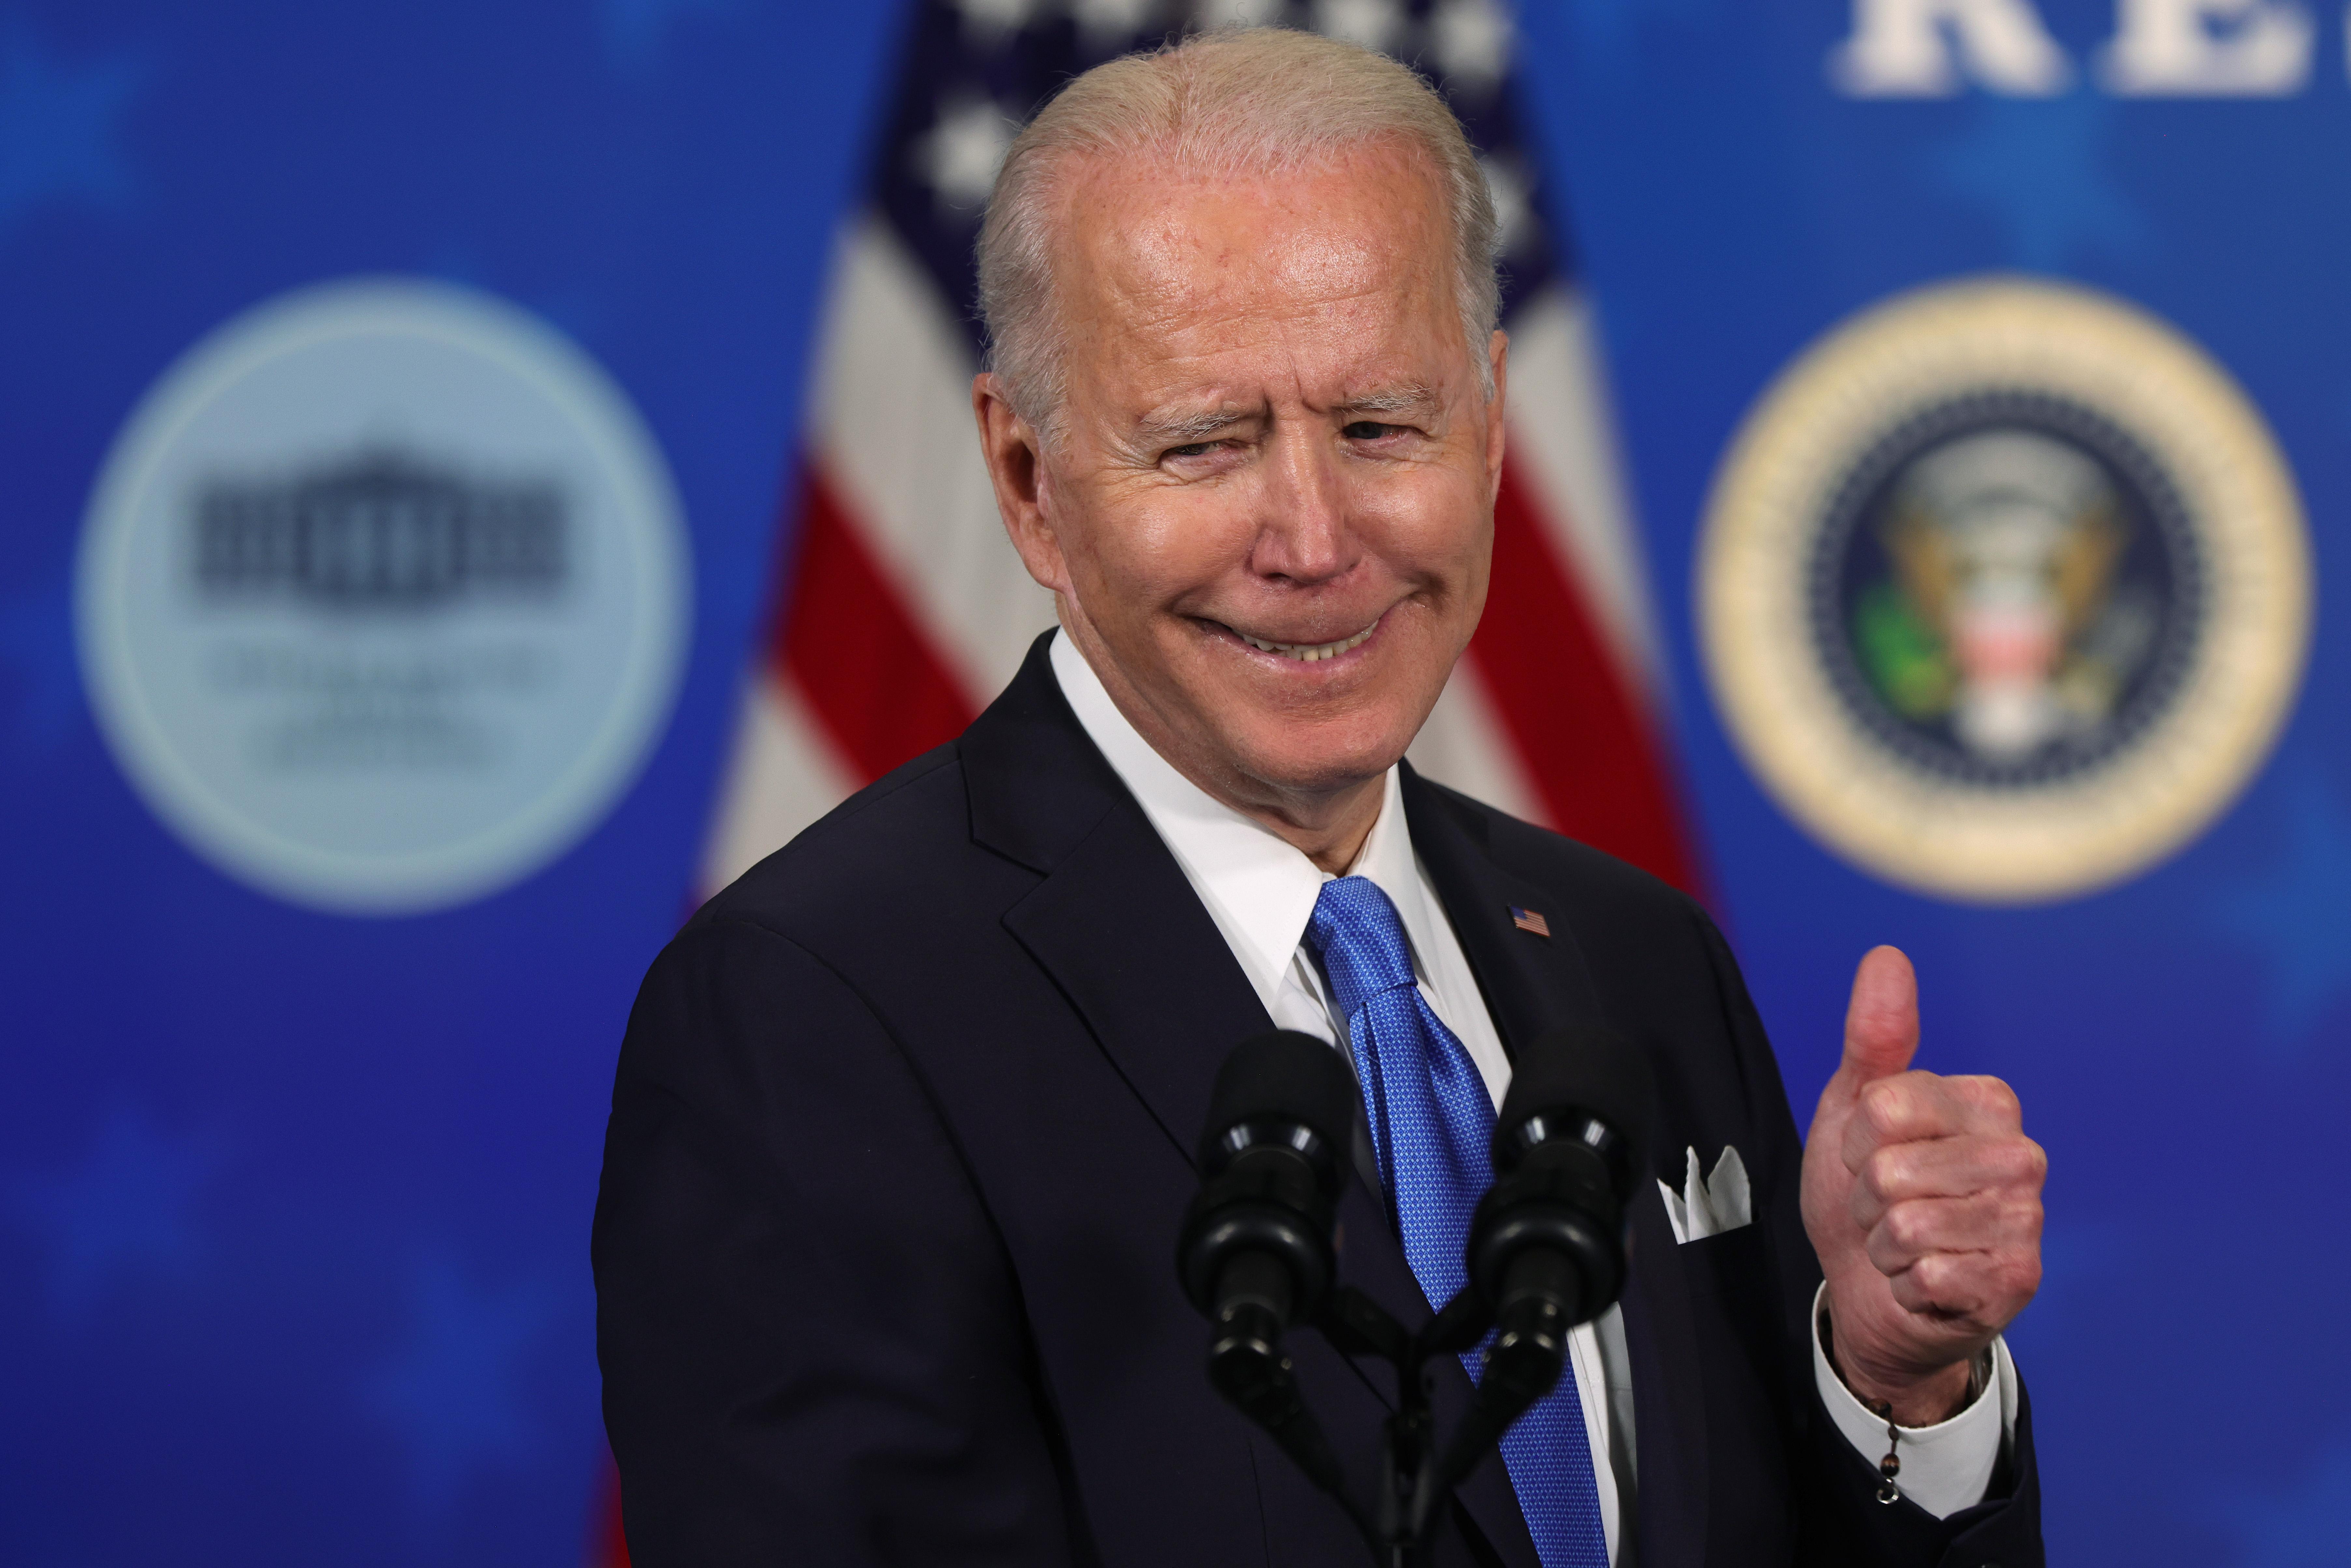 President Biden Hosts Event With Johnson & Johnson And Merck CEOs